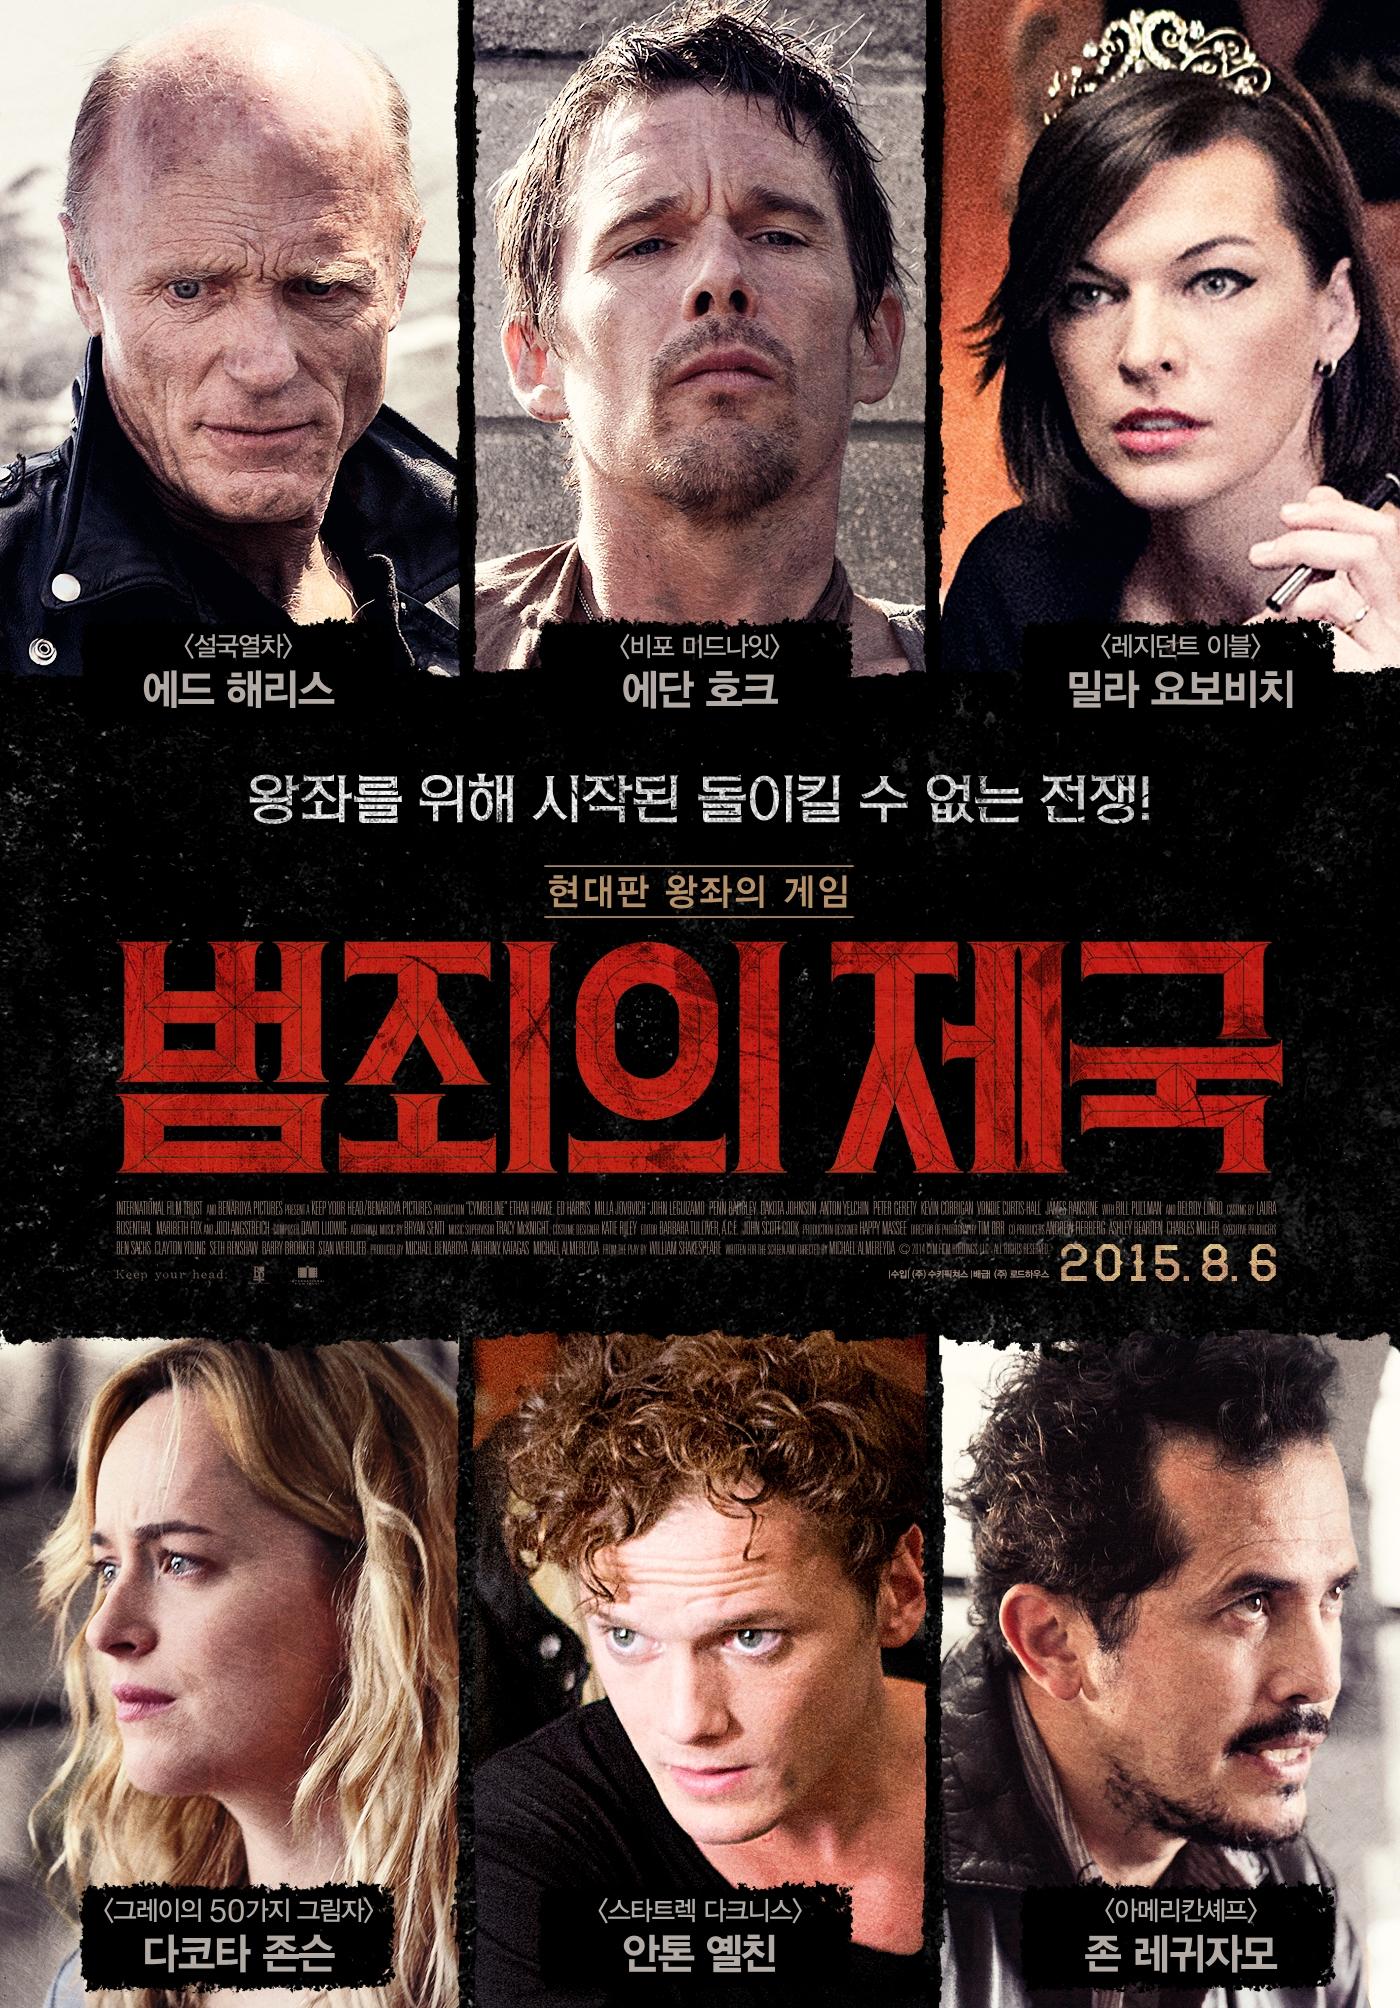 Cymbeline Movie Poster (Intl) 2.jpg